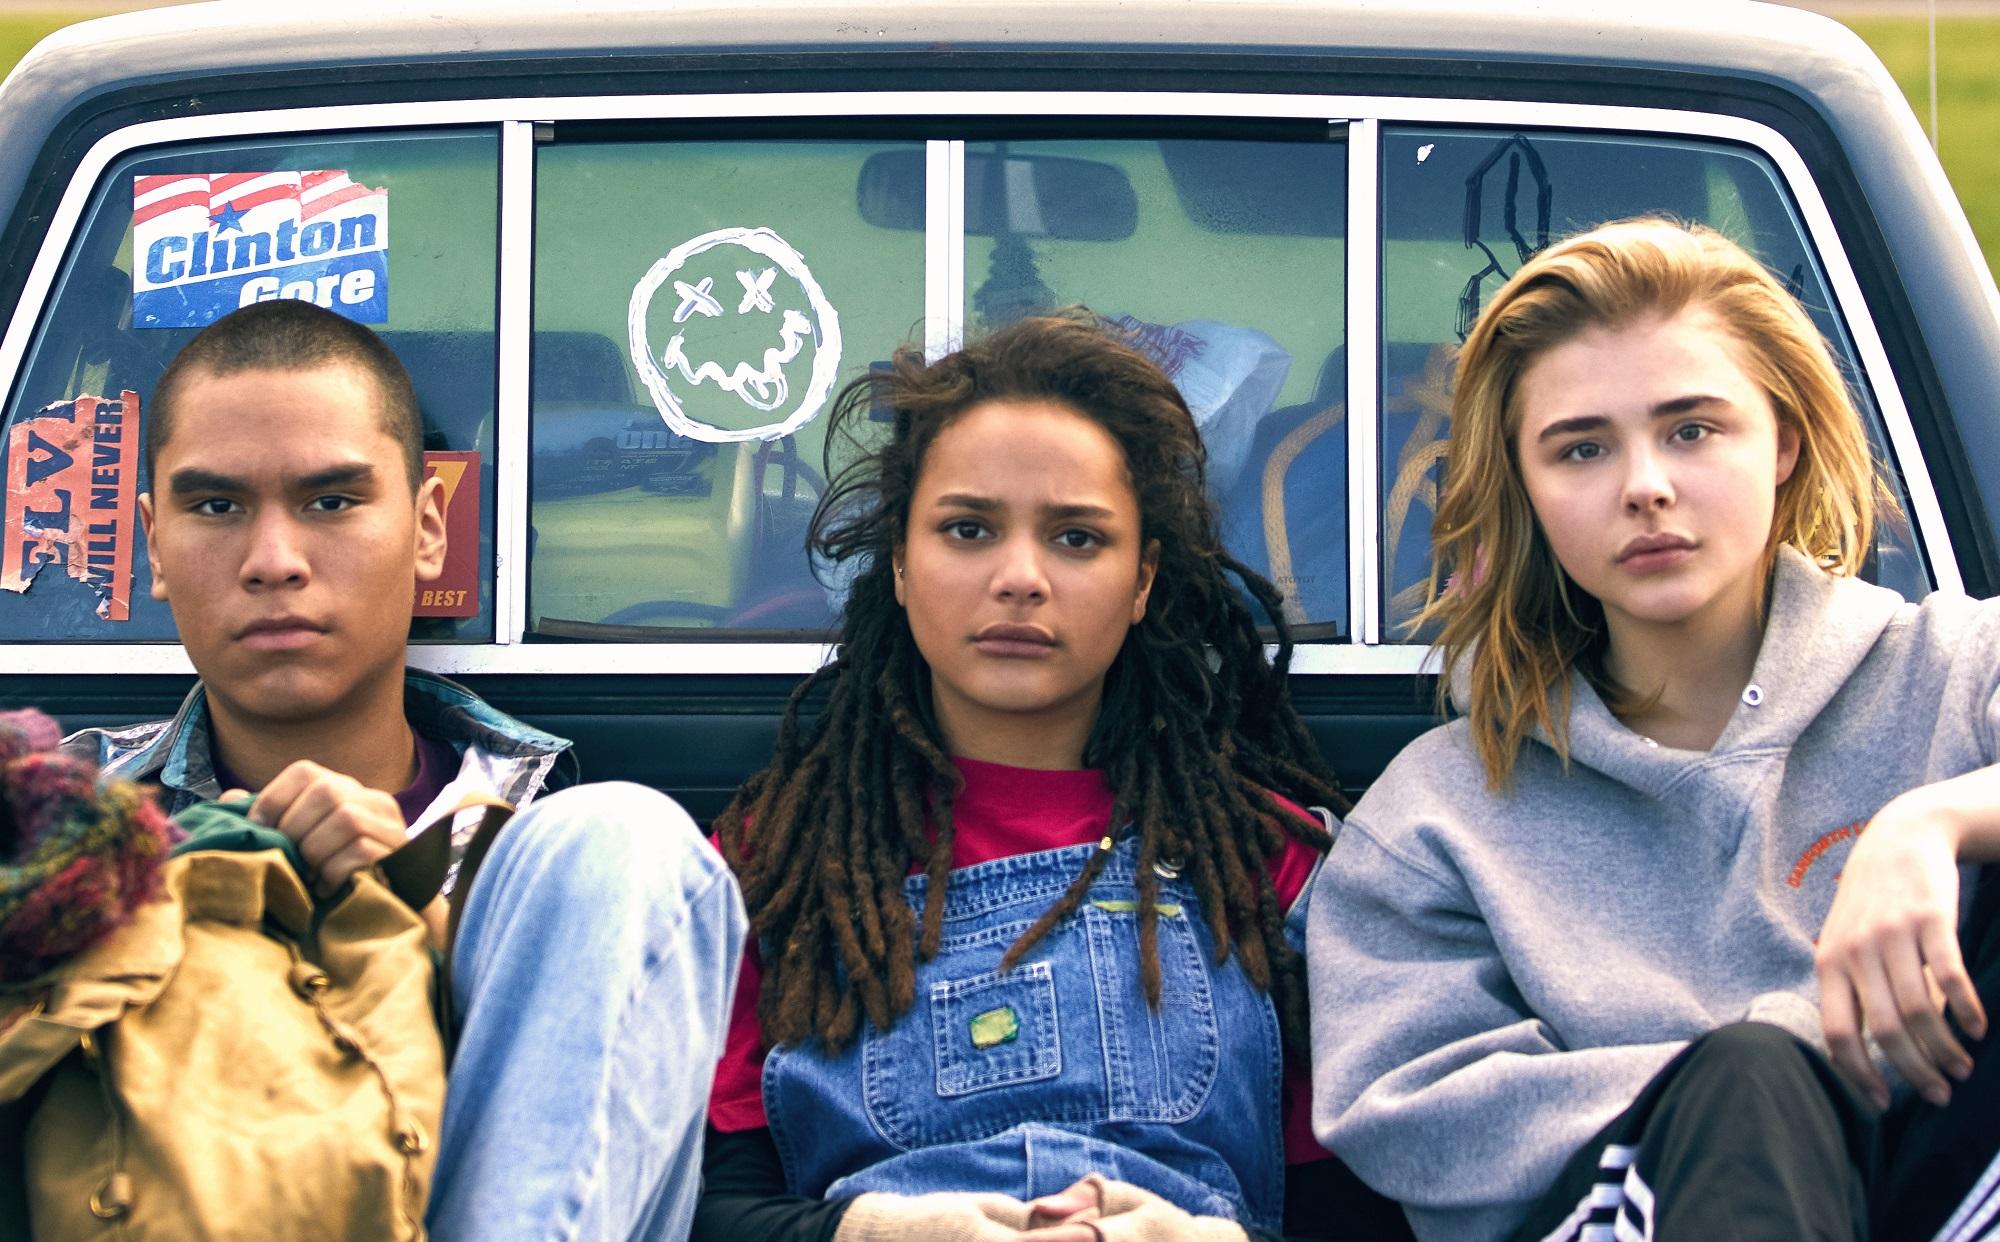 Forrest Goodluck, Sasha Lane and Chloe Grace Moretz.